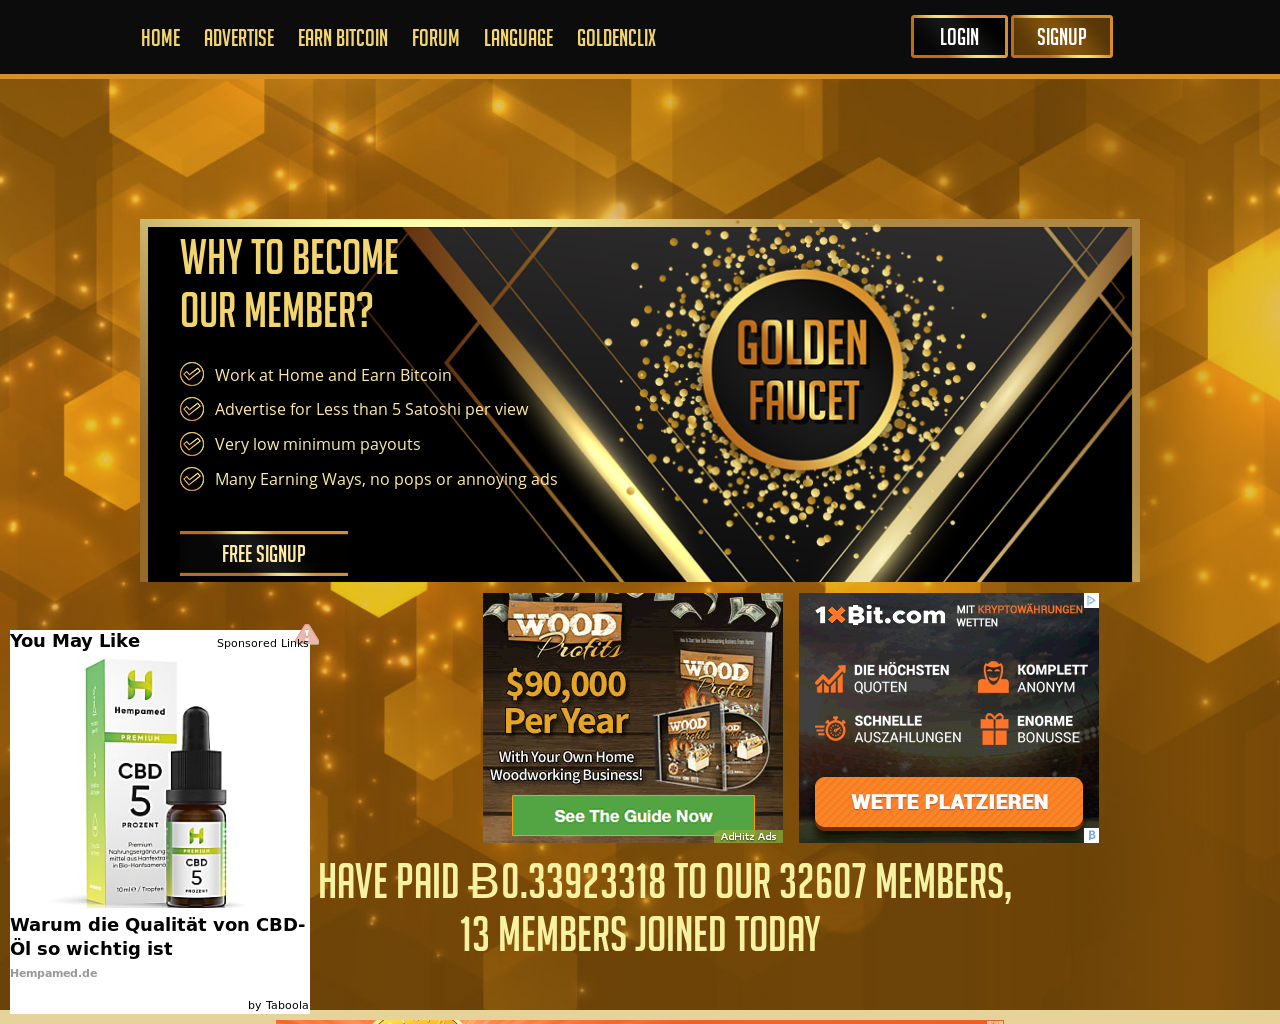 Goldenfaucet